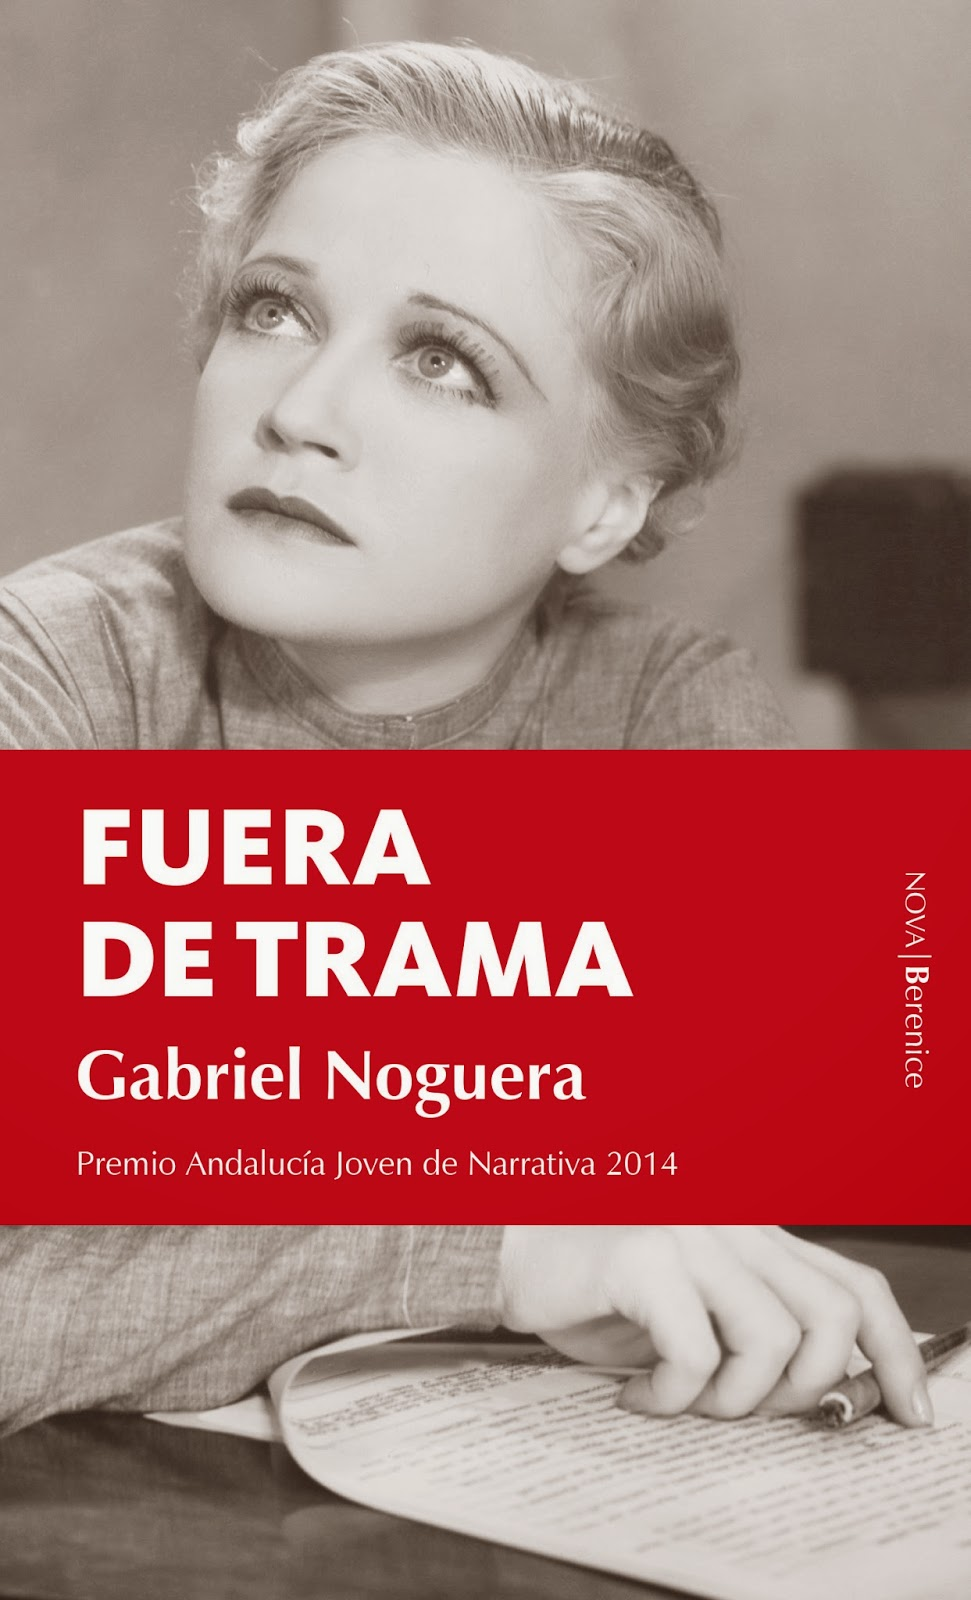 http://grupoalmuzara.com/a/fichalibro.php?libro=2957&edi=2